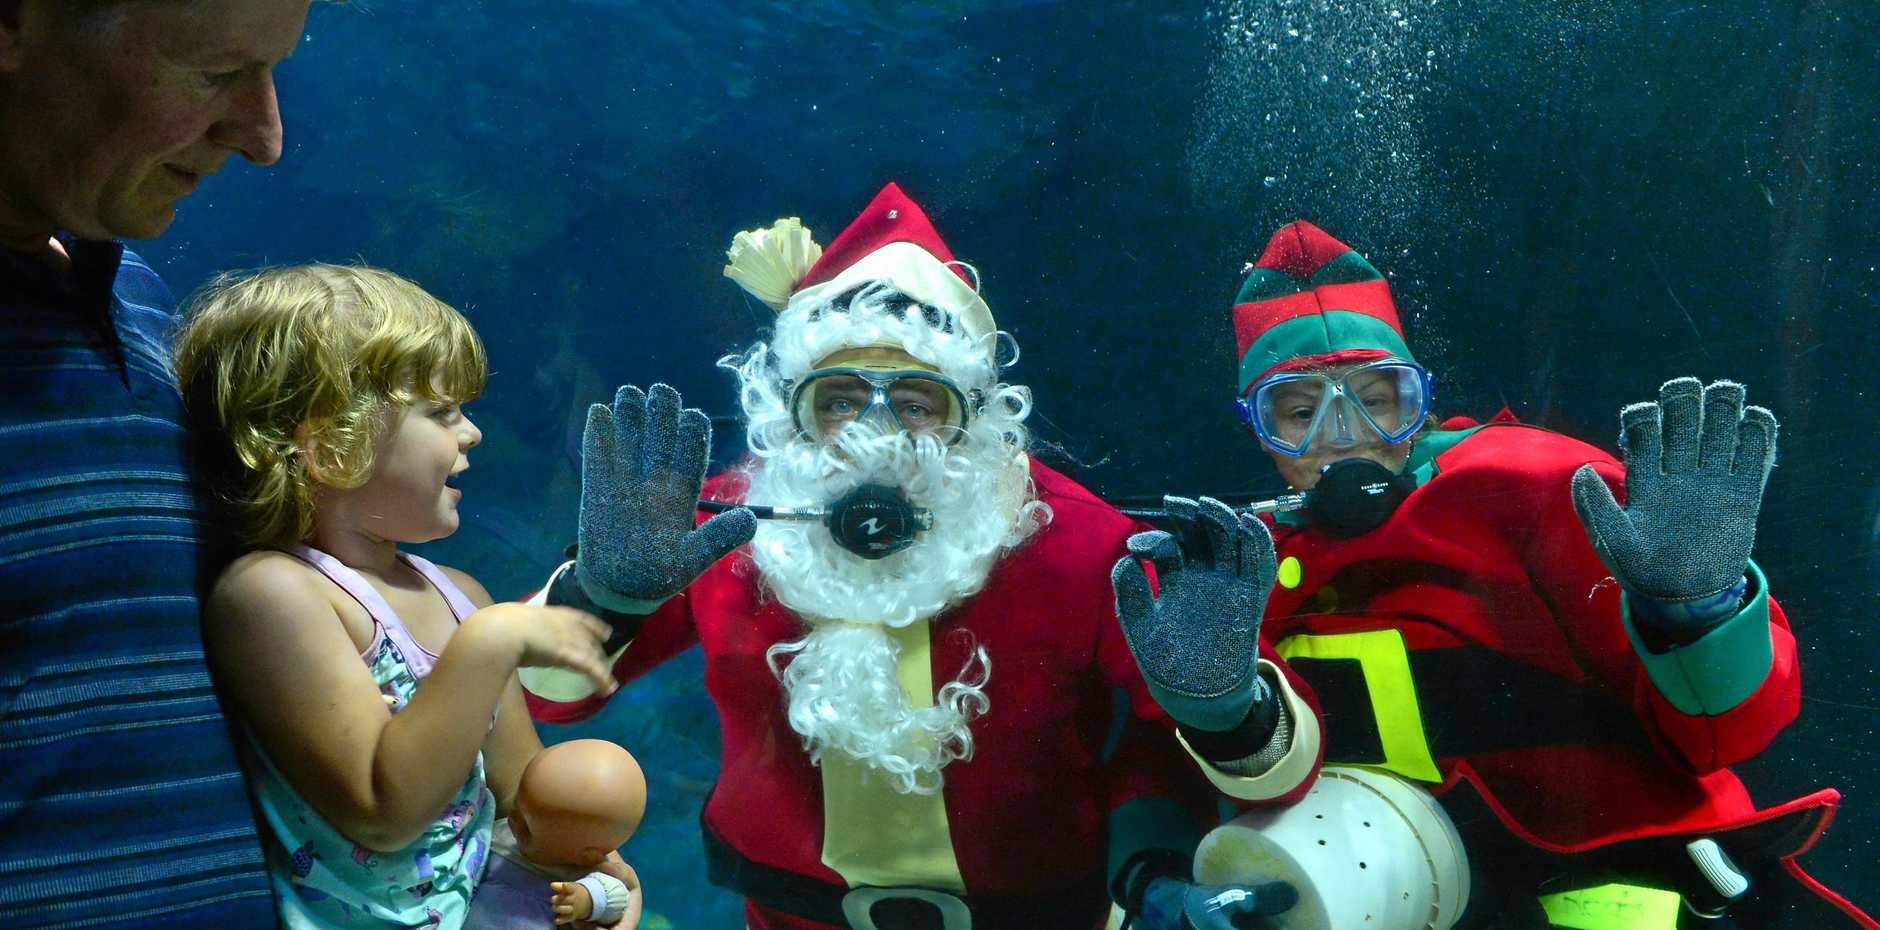 FESTIVE SPLASH: It's Christmas at Sea Life in Mooloolaba as Scuba Santa and a Scuba Elf arrived. John and Charlotte Stewart watch through the glass..